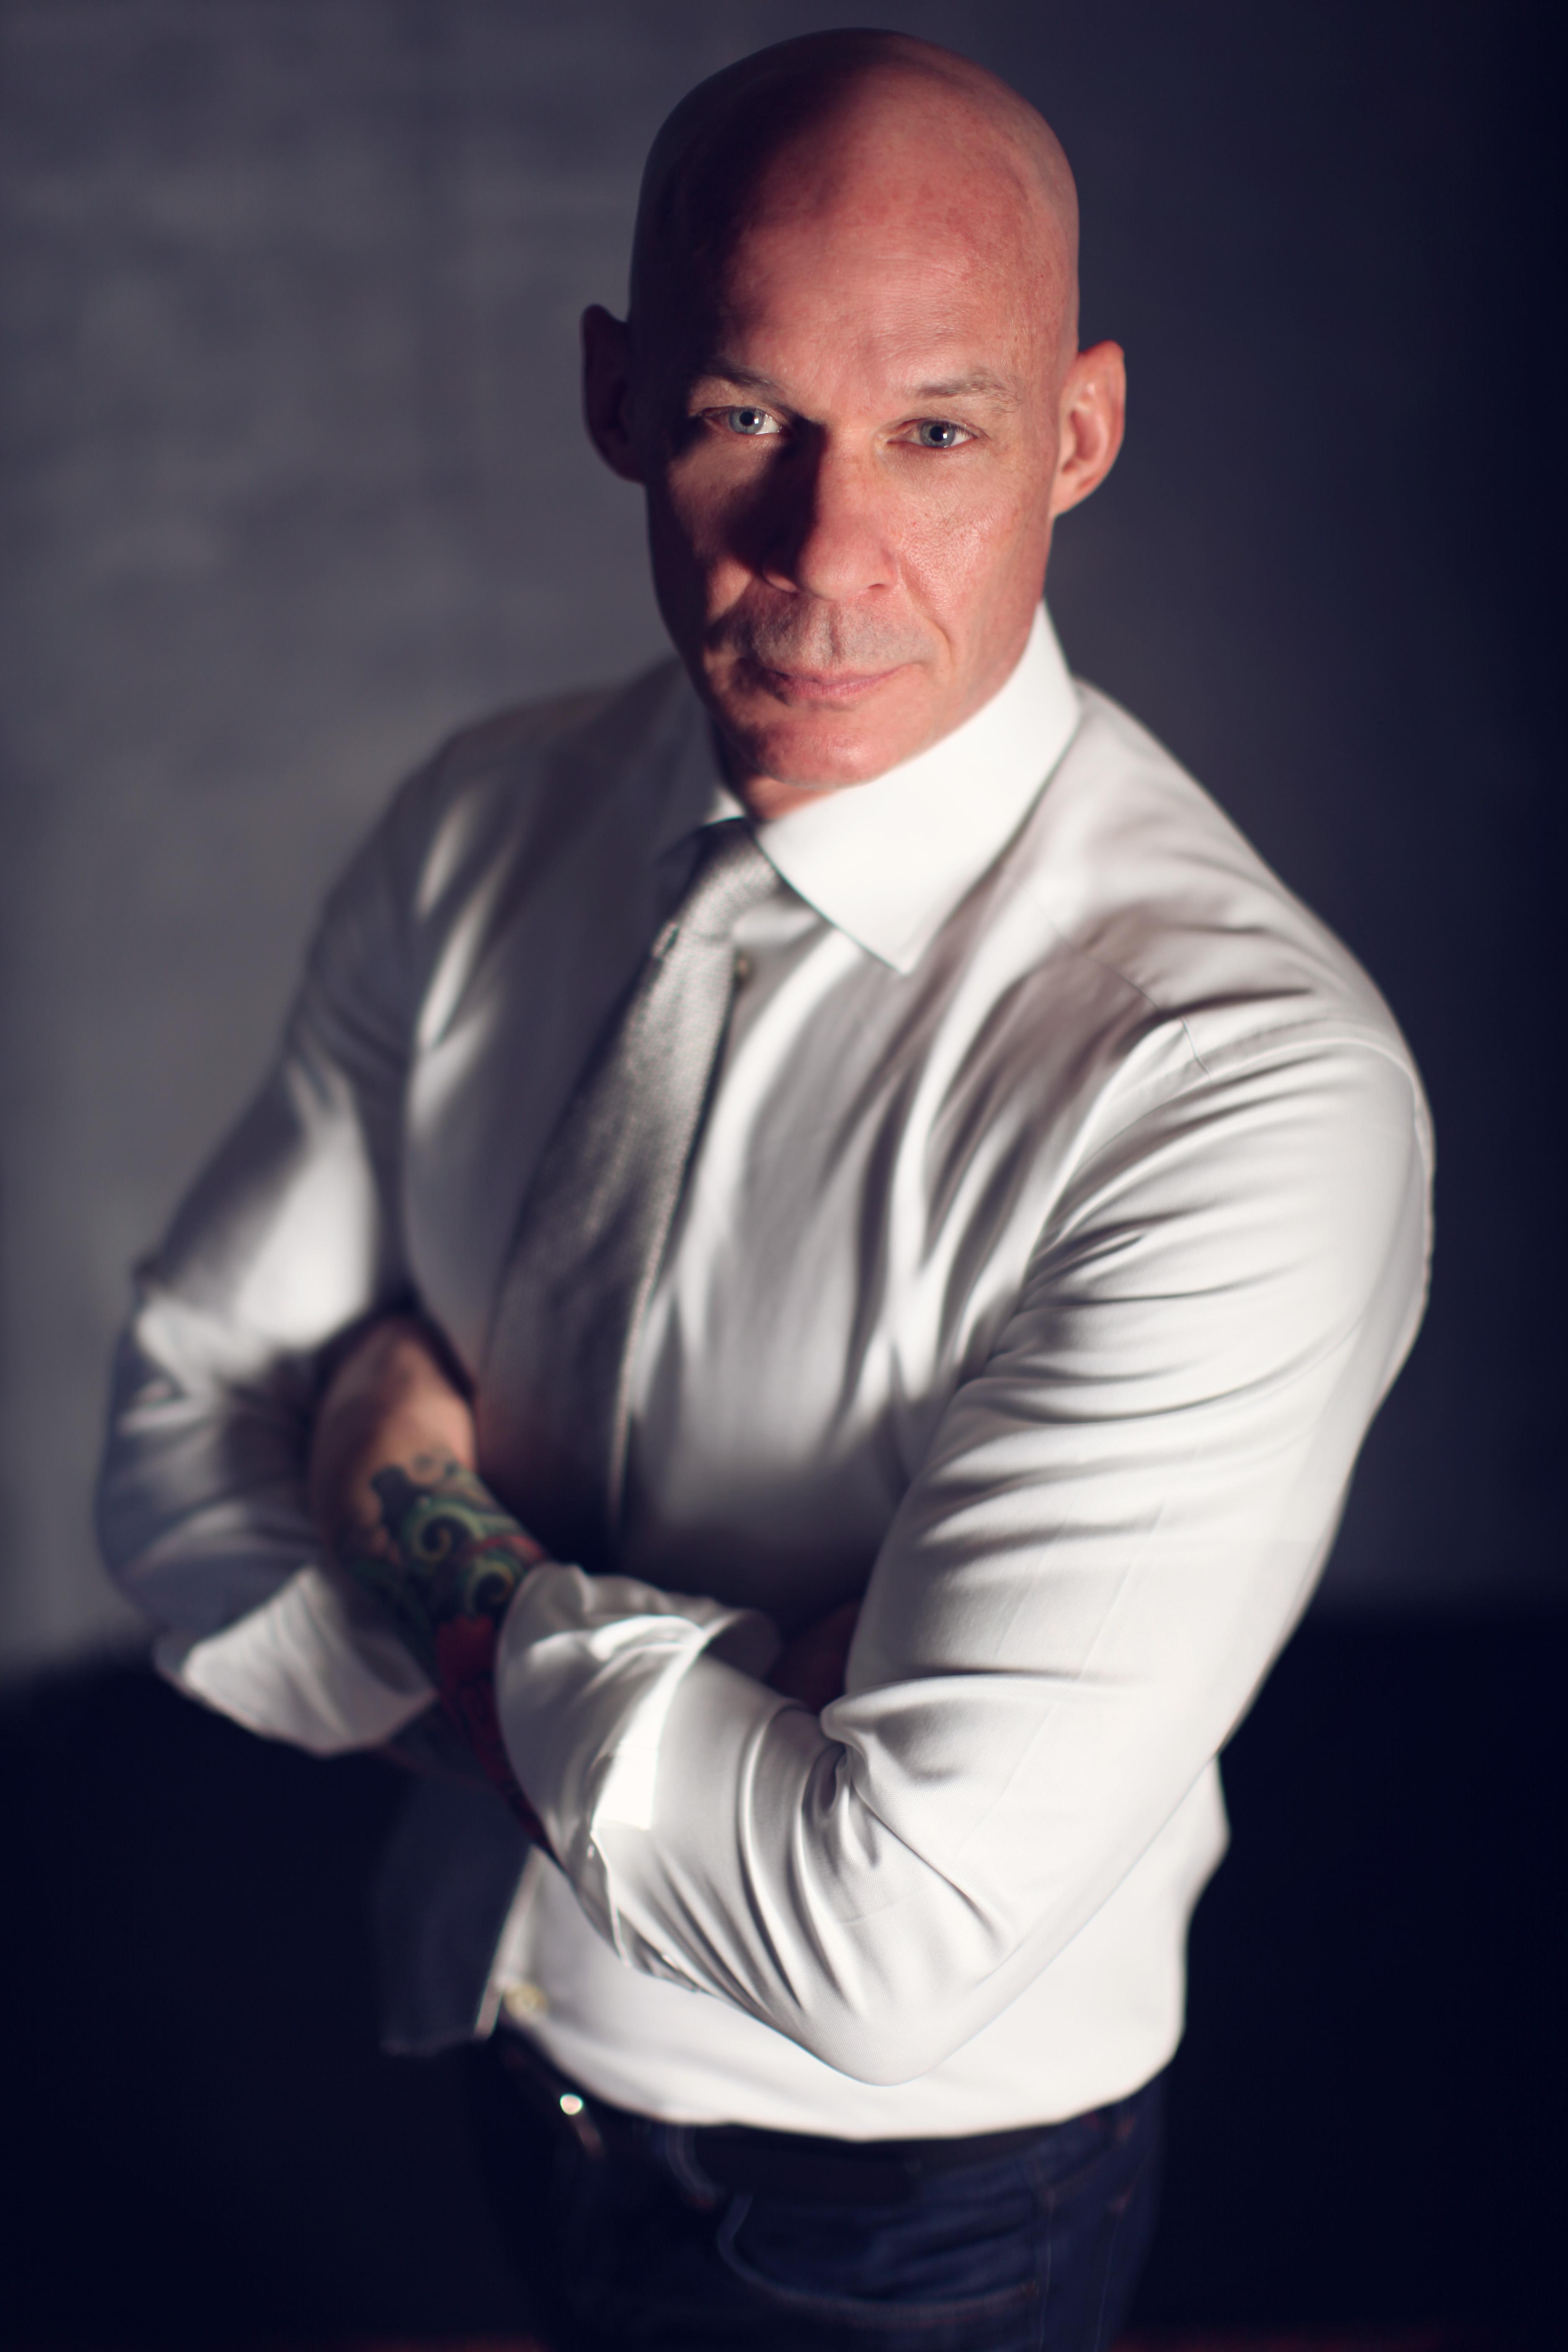 Douglas Heikkinen